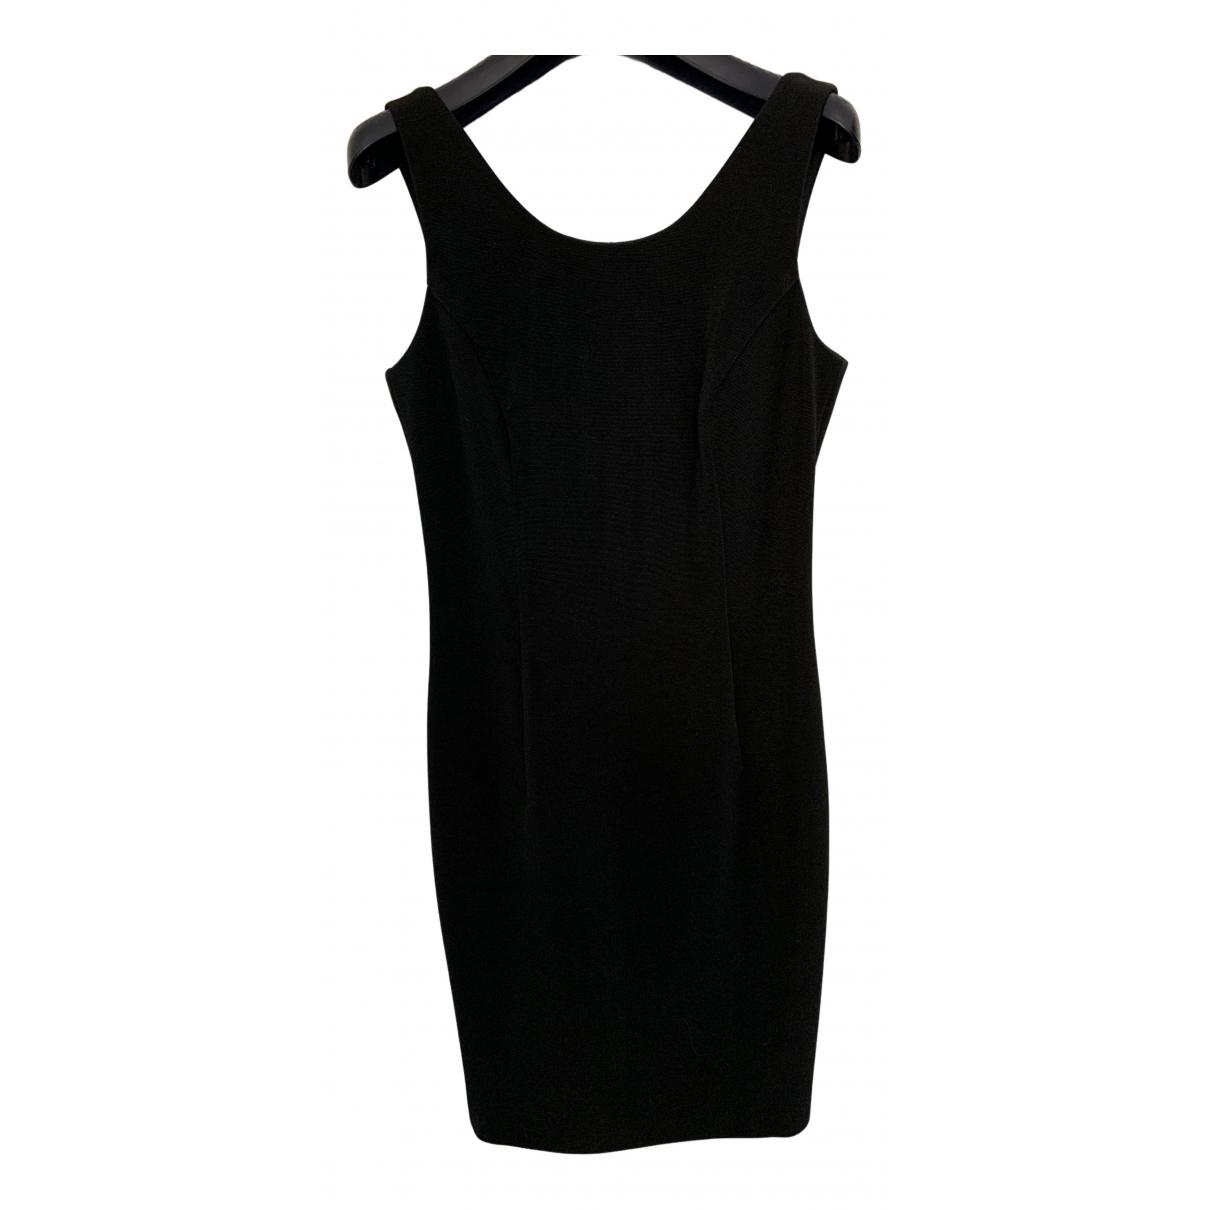 Joseph Ribkoff N Black dress for Women 10 UK